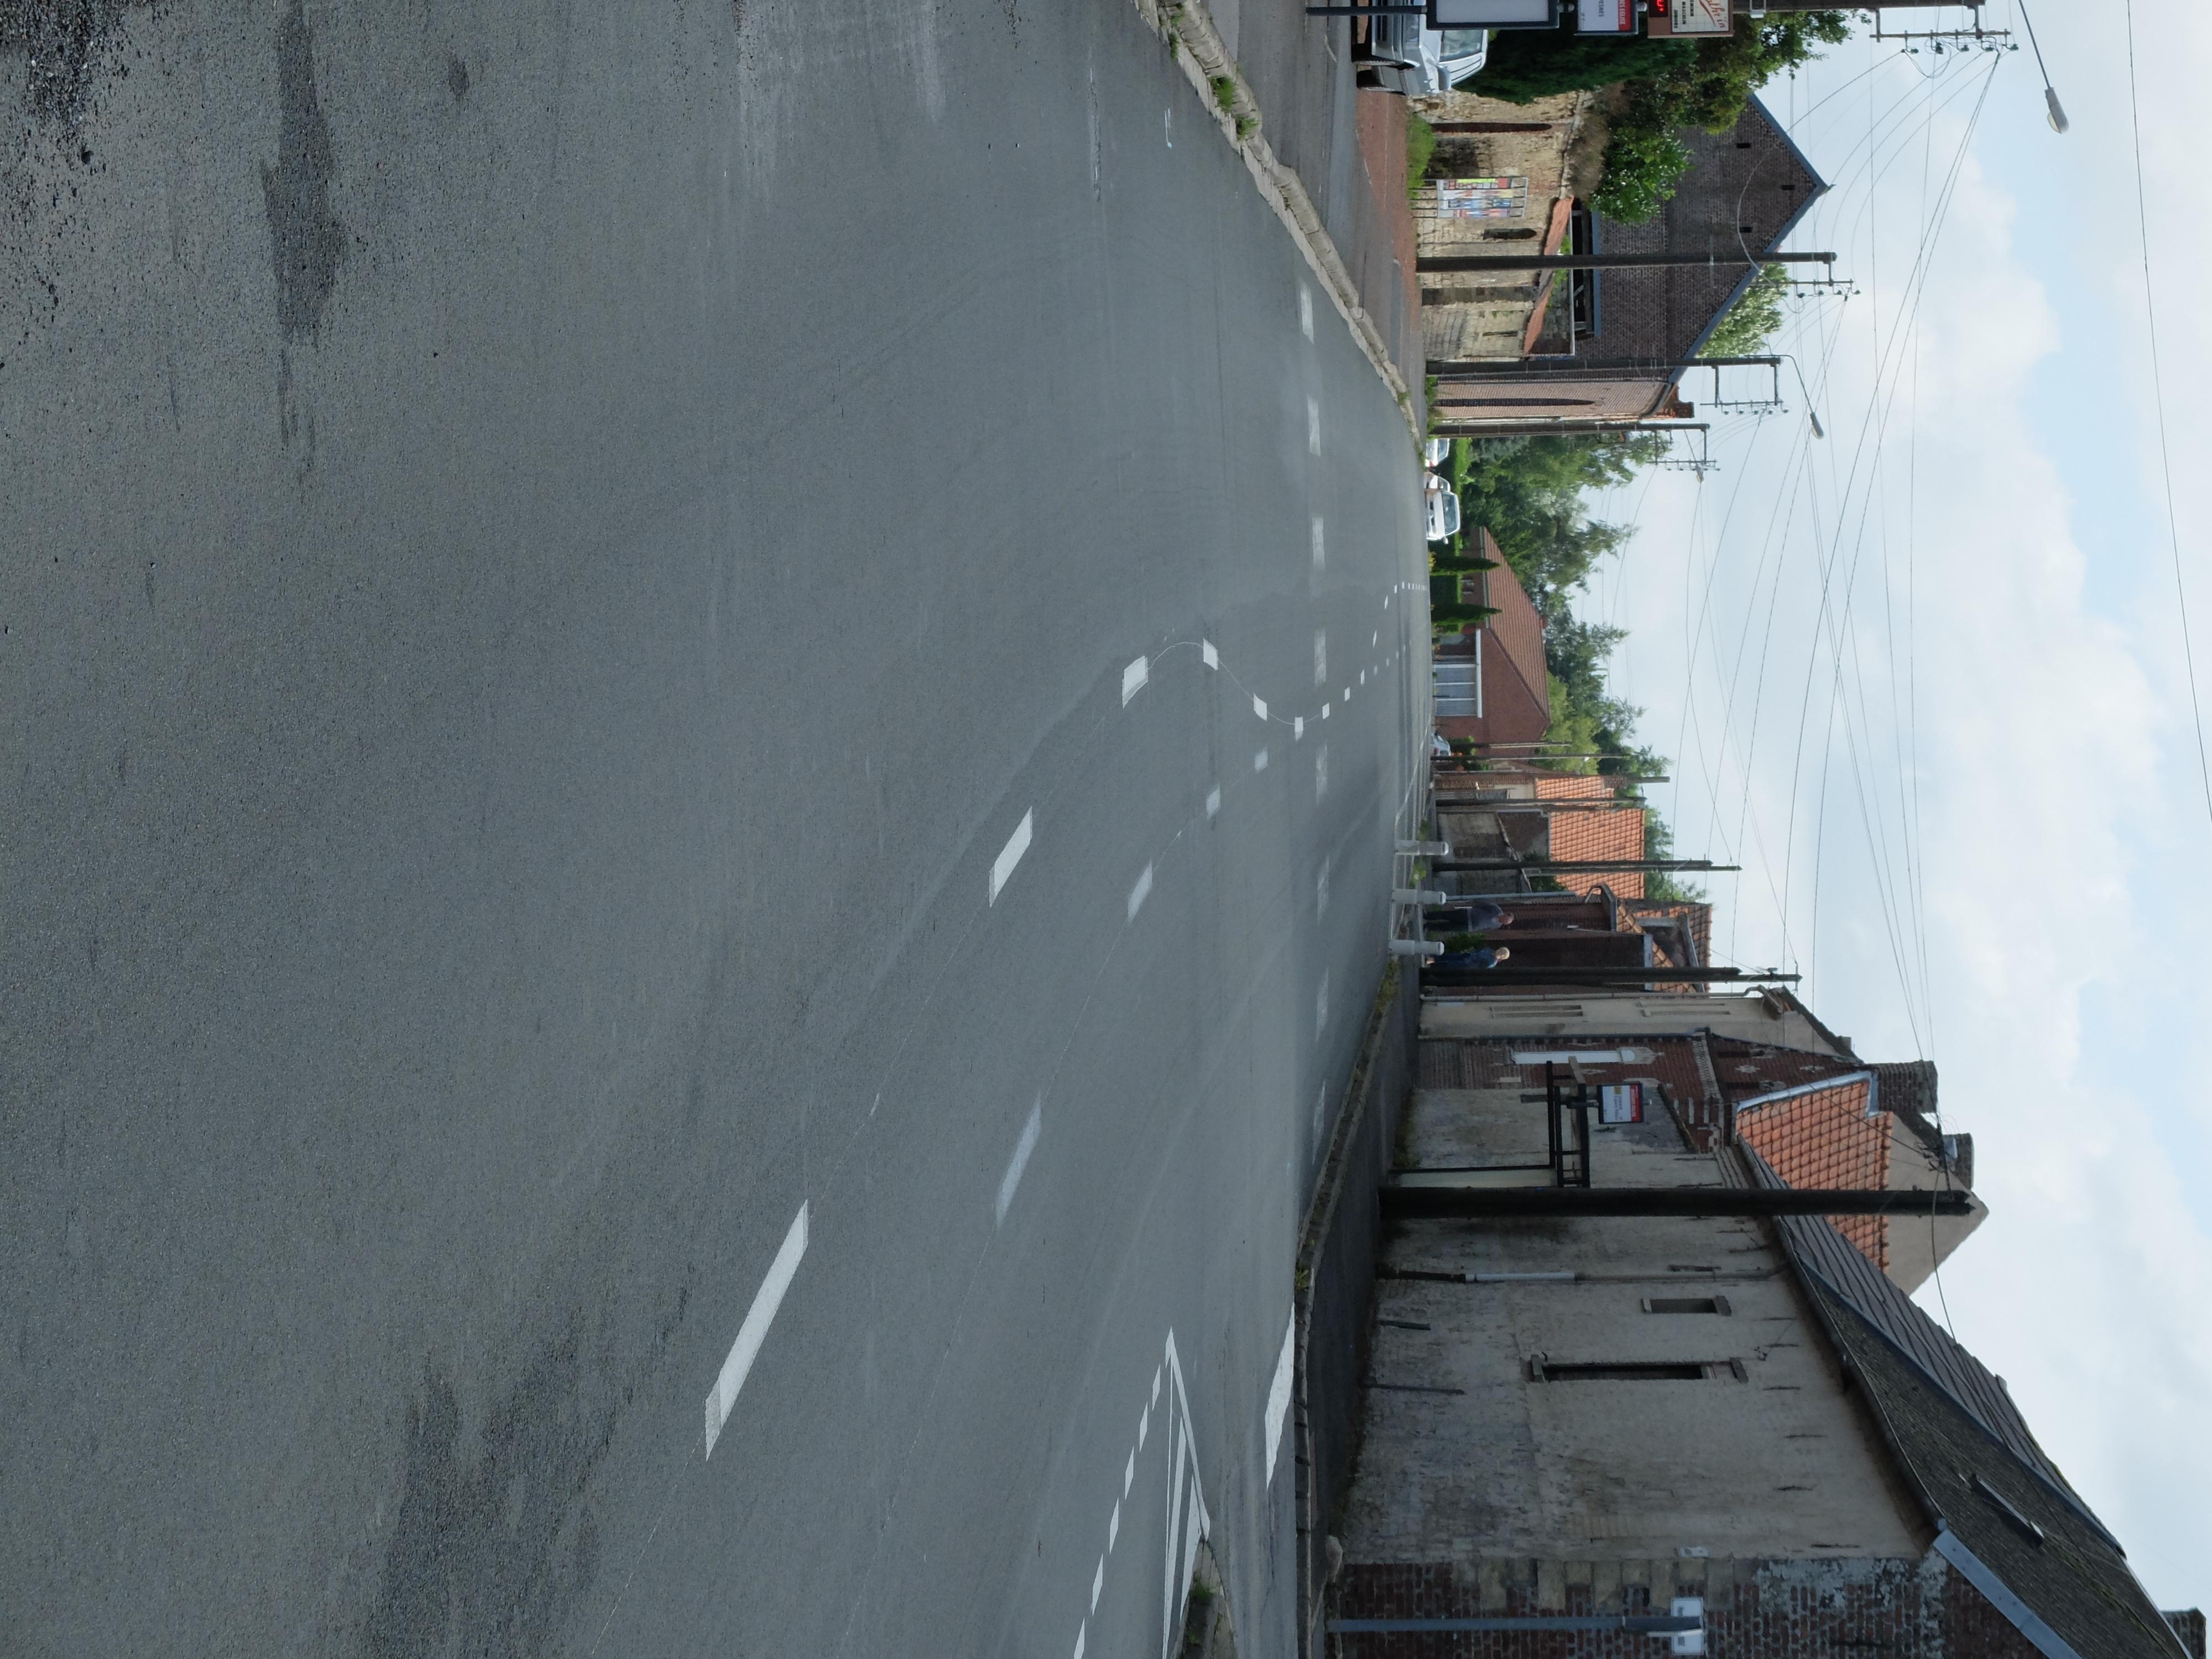 Avesnes-le-Sec